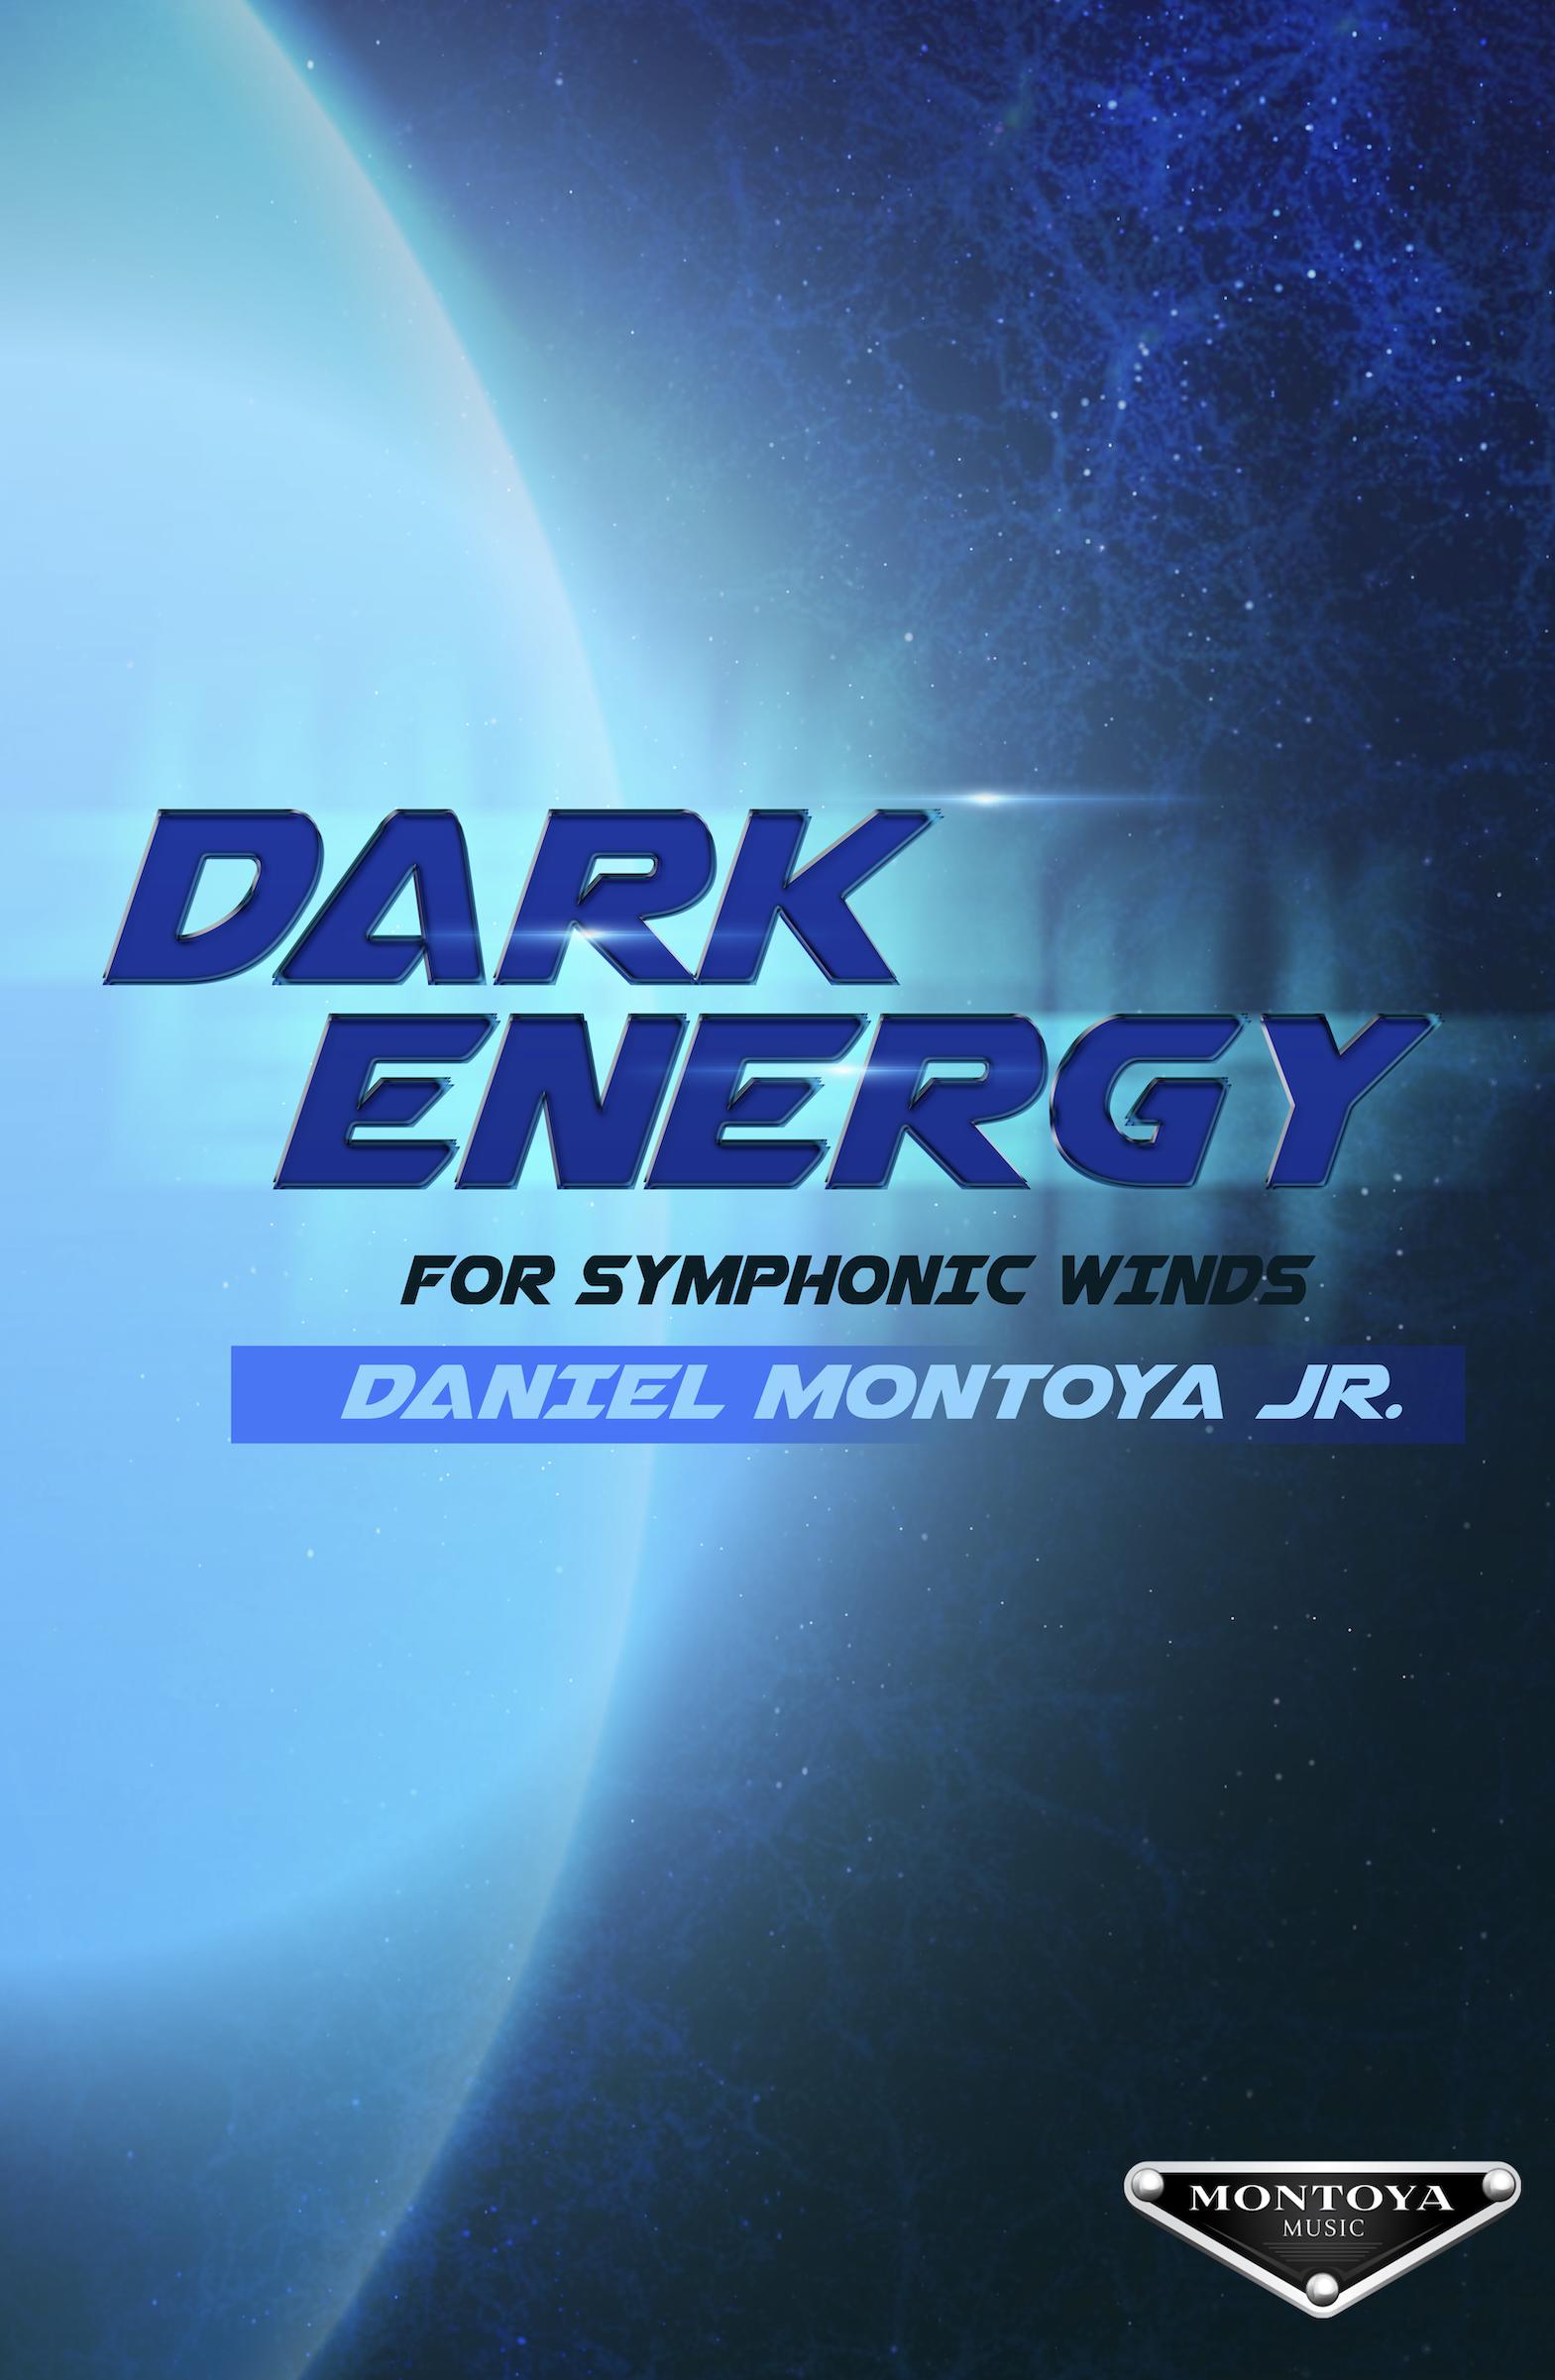 Dark Energy by Daniel Montoya Jr.